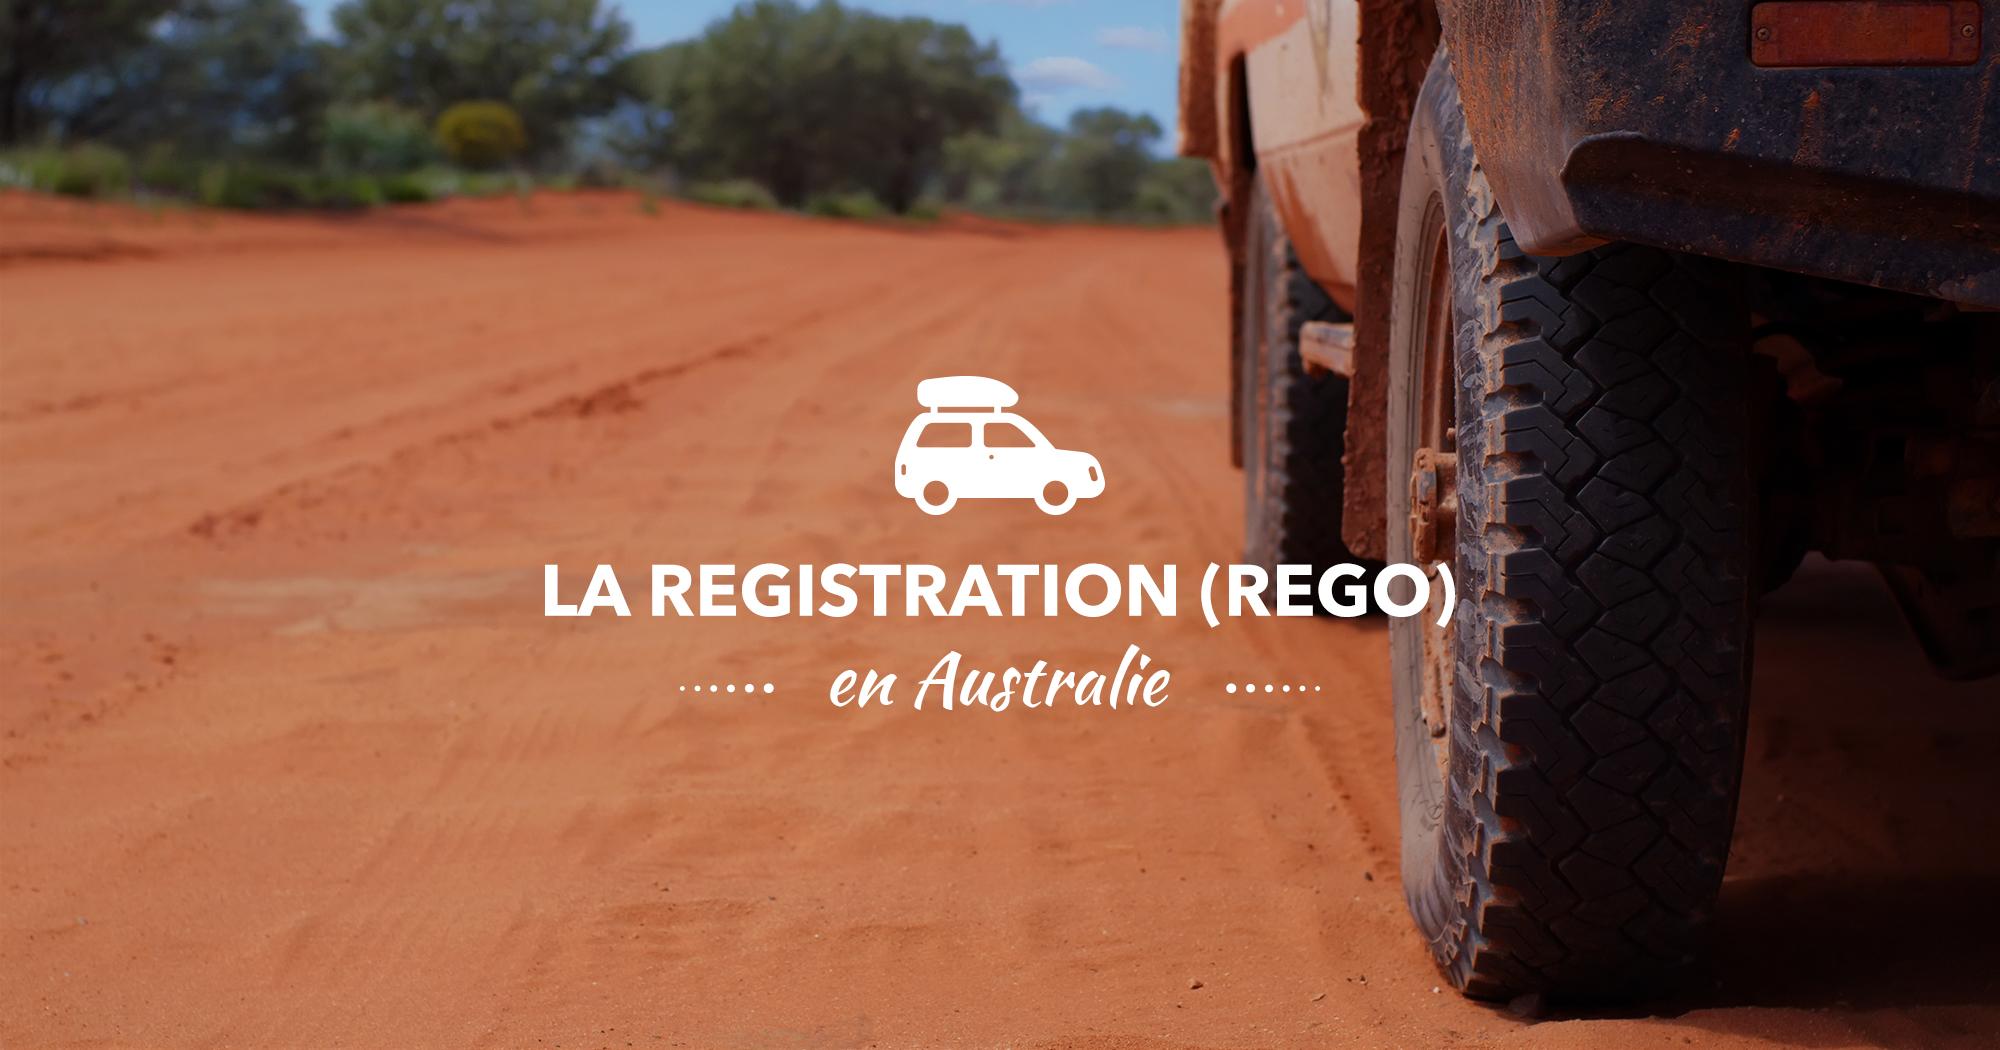 visuels-dossiers-whv-australie-registration-rego